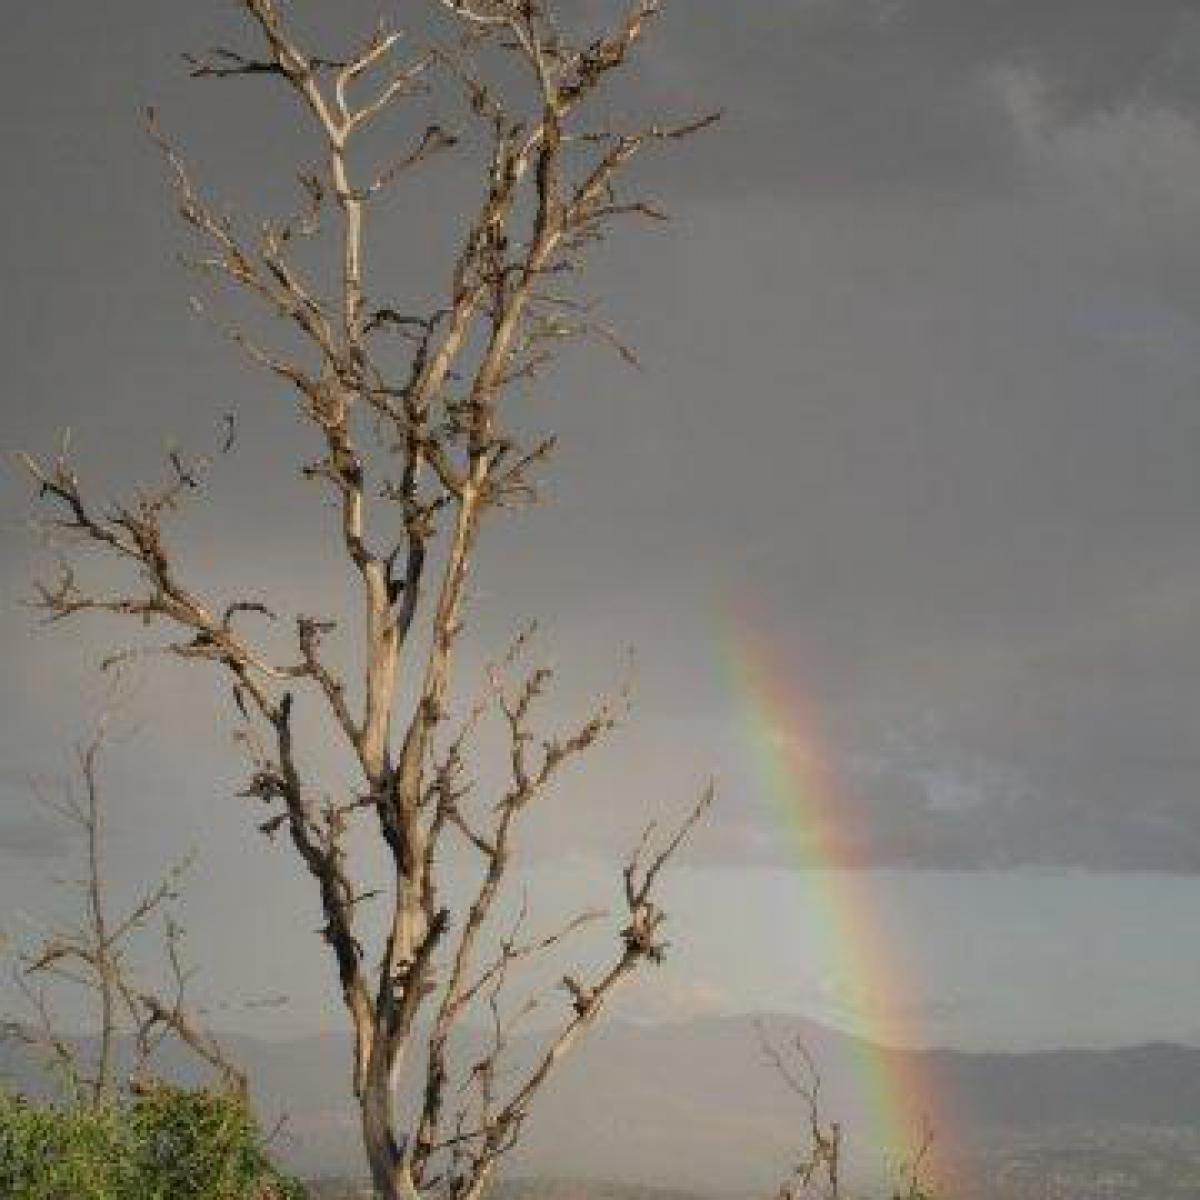 Rainbow over Tuggeranong Valley